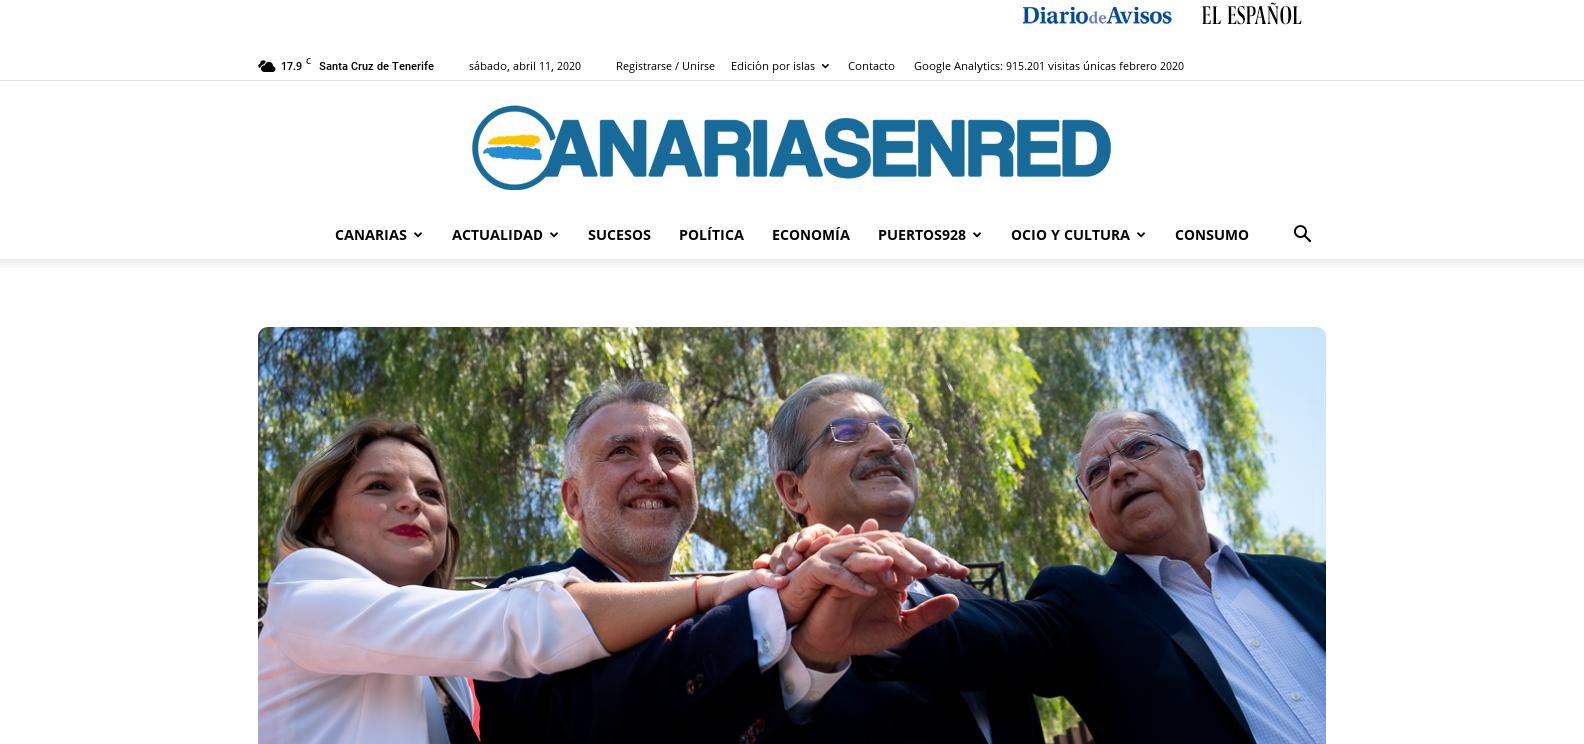 Spanish Guest Post on elespanol. com DA 91 DR 84 - Newspaper editorial